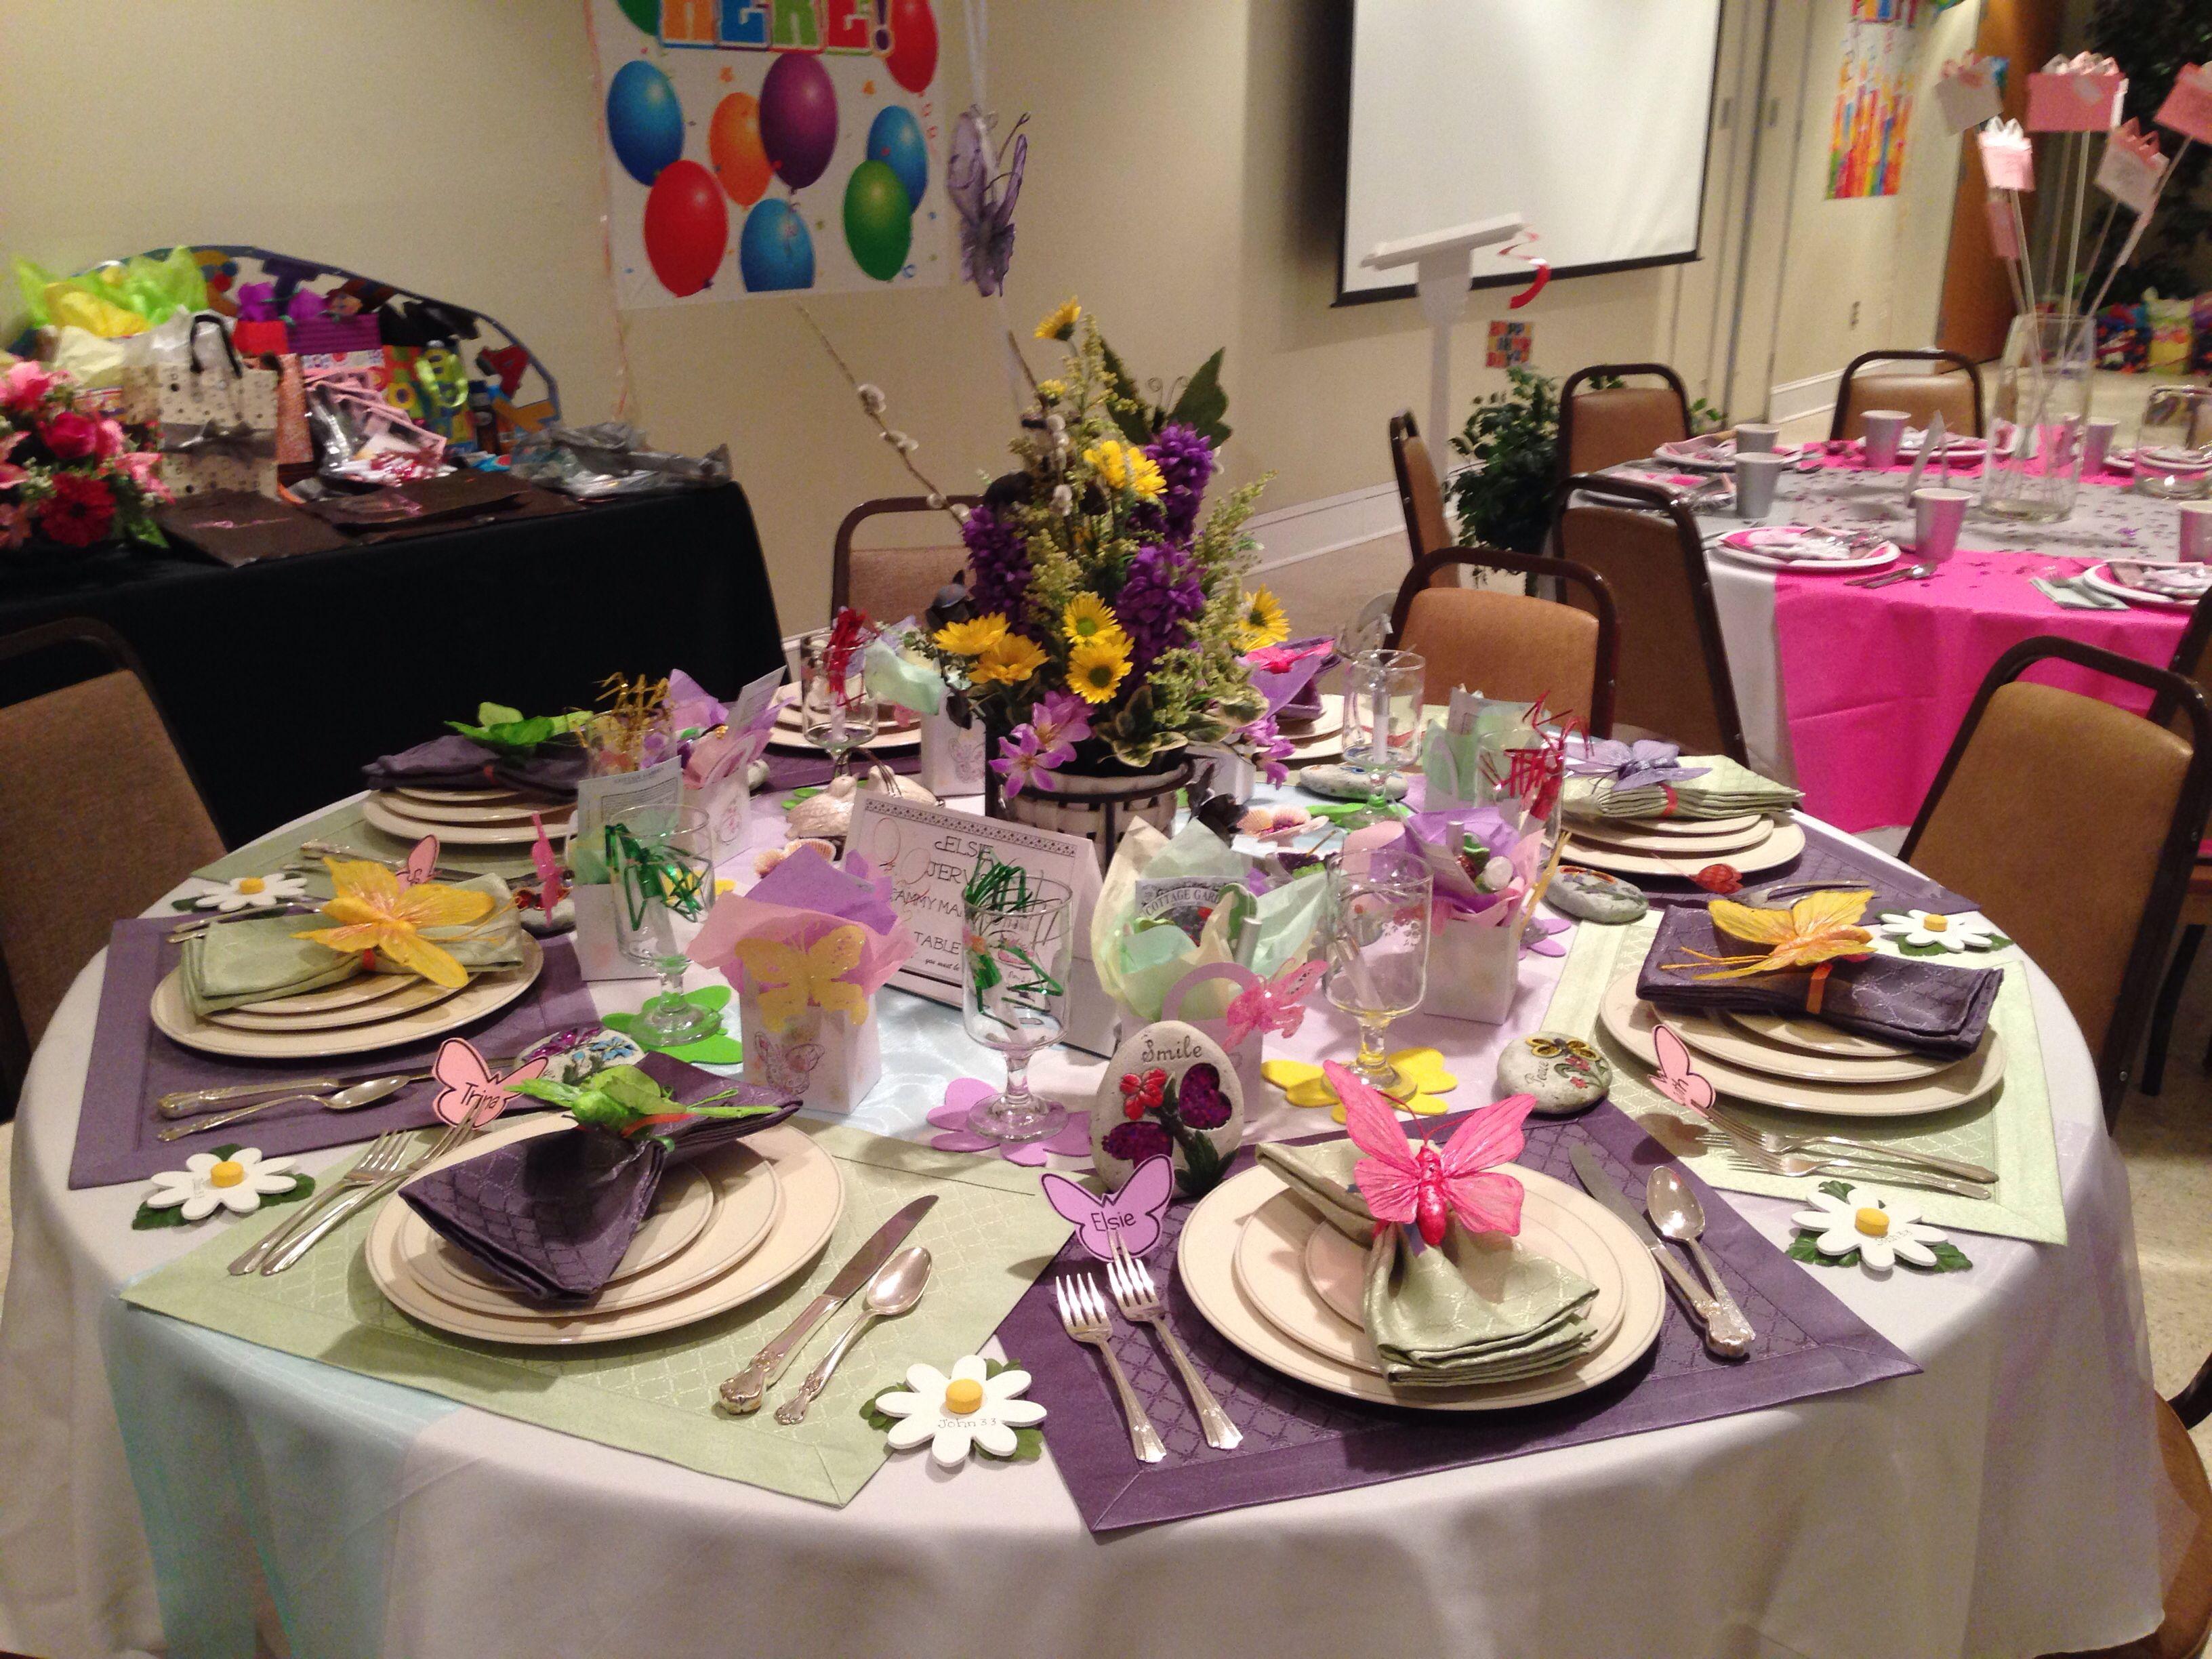 Parade Of Tables 2014 2014 Parade Of Tables Spiritual Birthday Celebration Pinterest